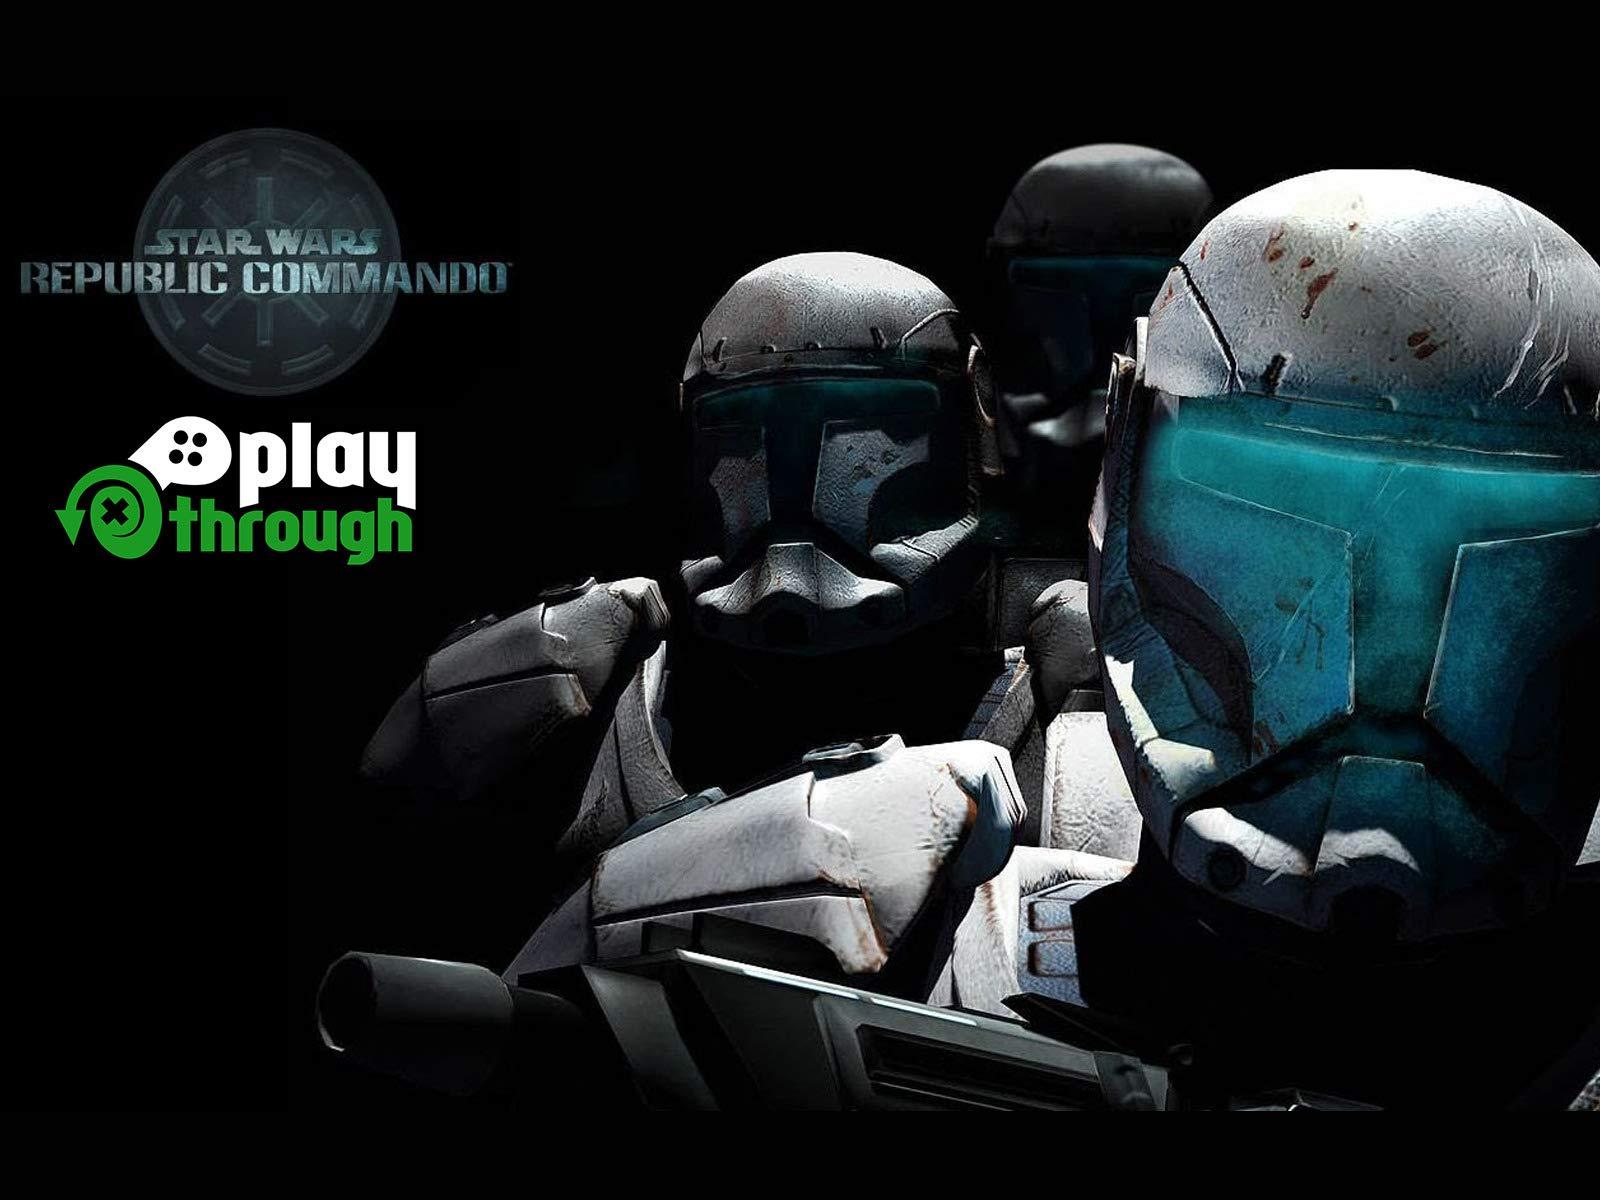 Watch Star Wars Republic Commando Playthrough Prime Video